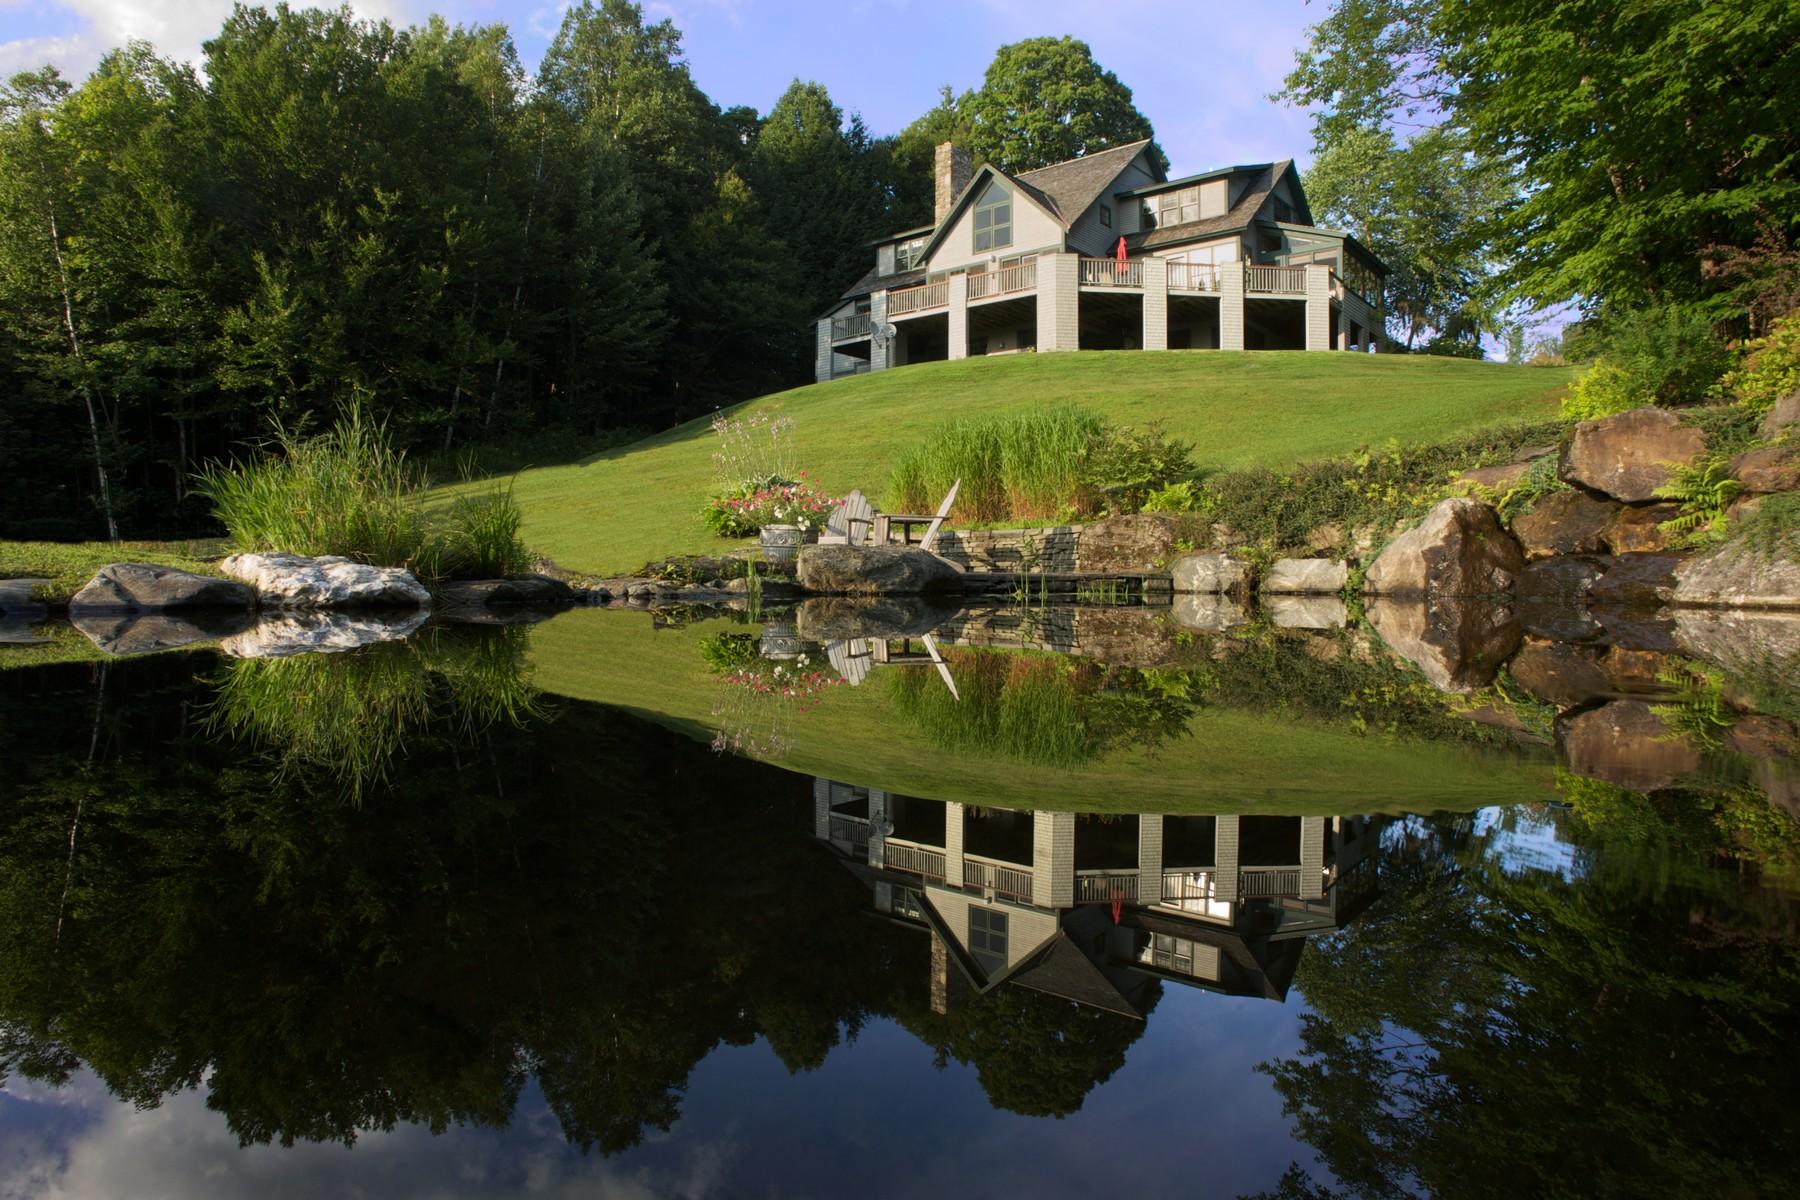 獨棟家庭住宅 為 出售 在 Craftmanstyle Living 267 Weeks Hill Meadow Stowe, 佛蒙特州 05672 美國